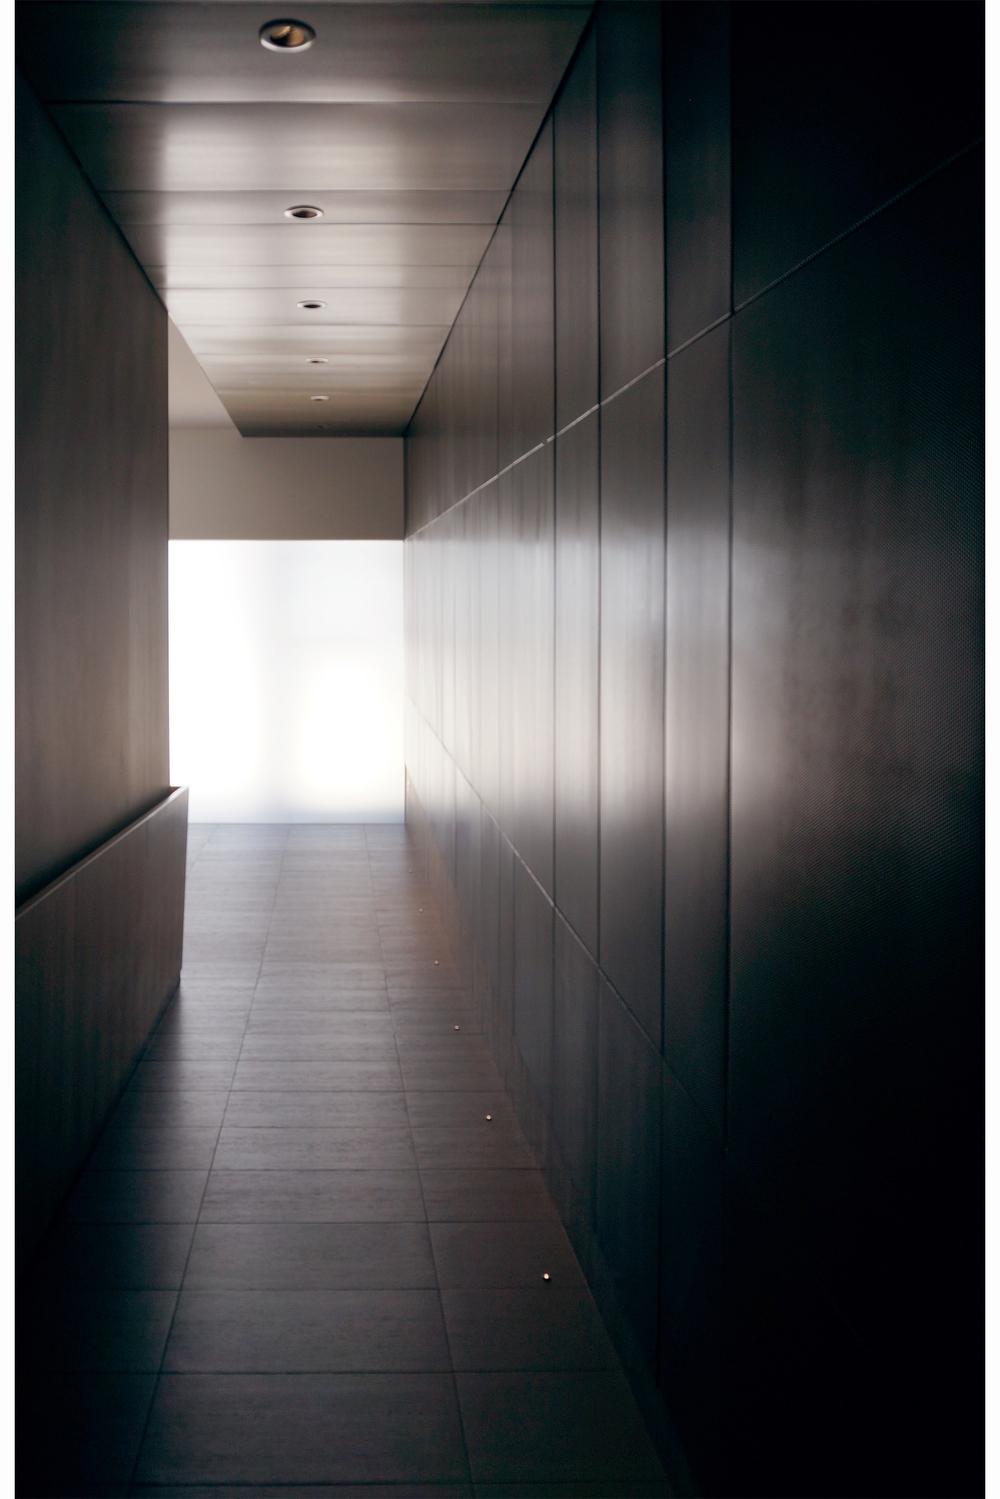 grace_3_entry_hall_1.jpg